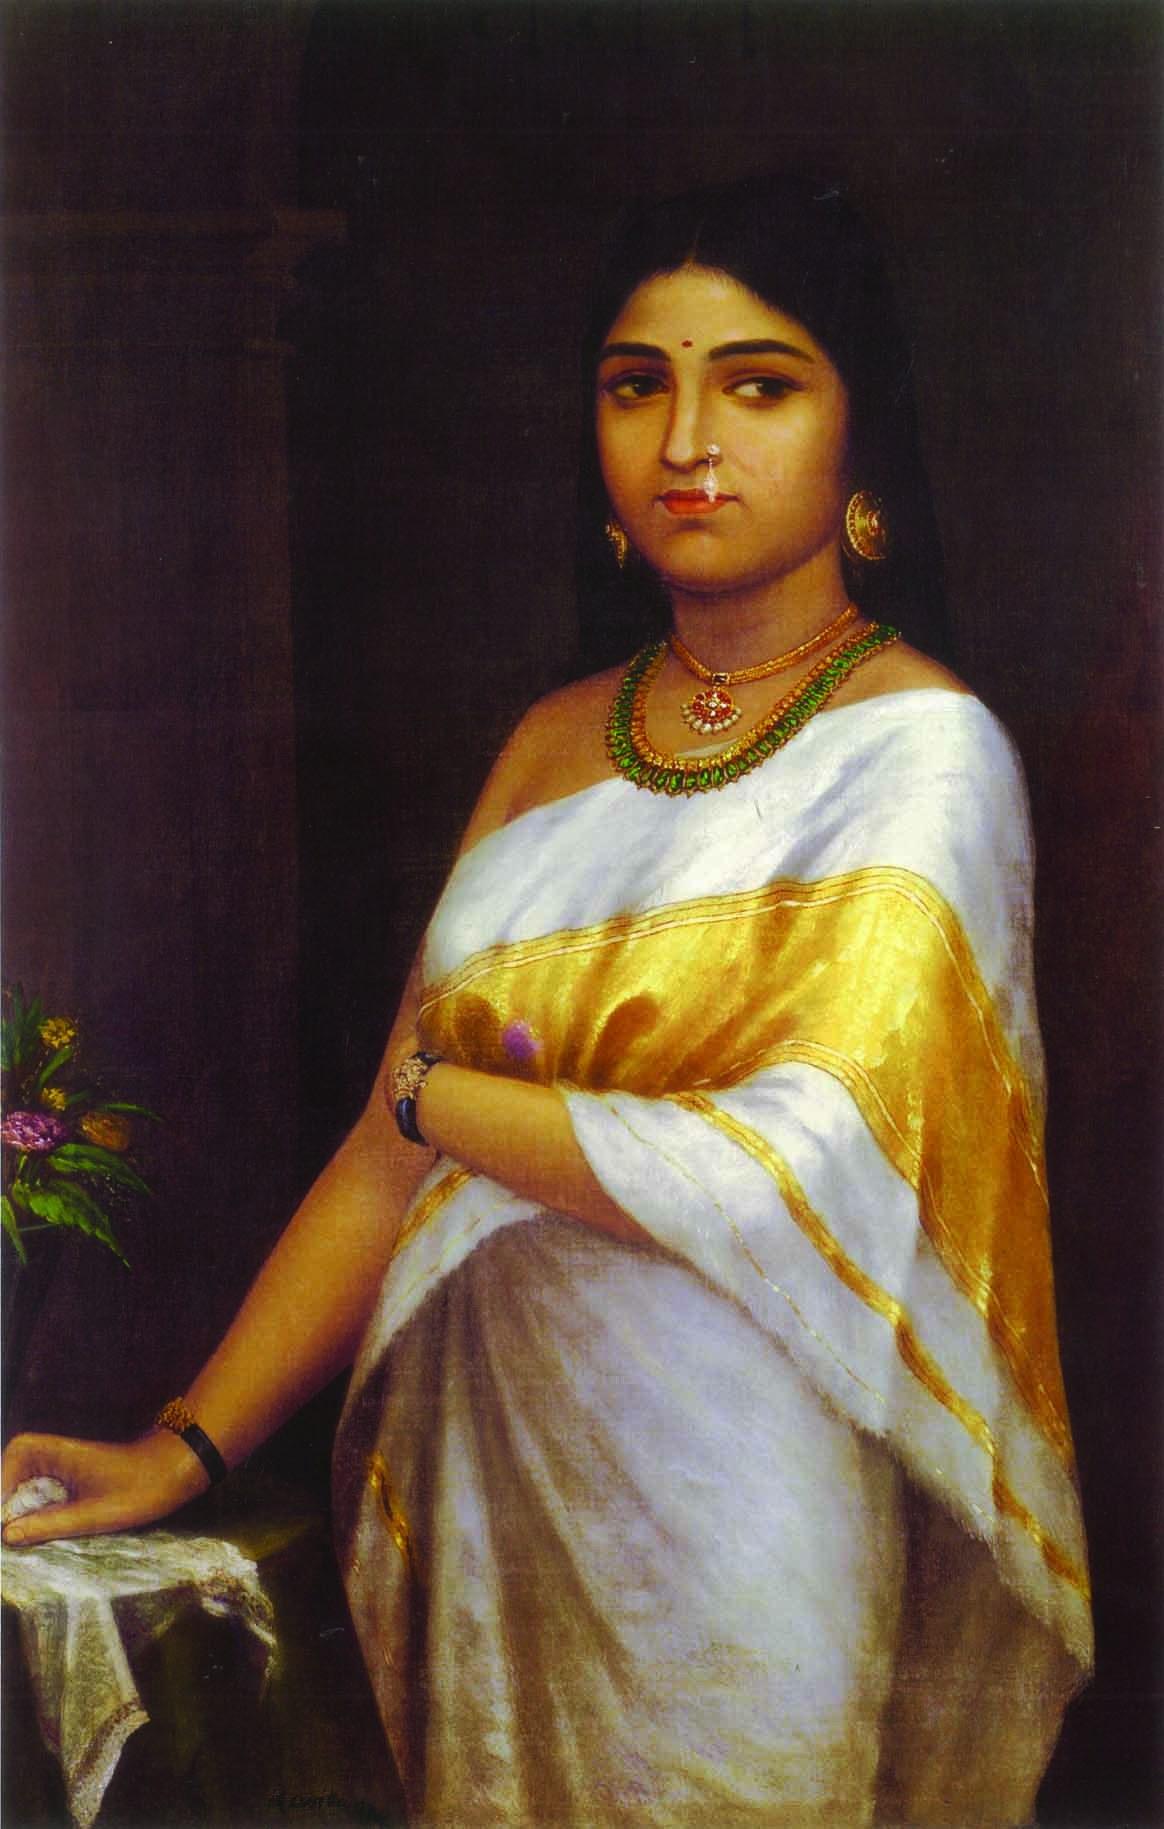 'Malayalee woman' - Raja Ravi Varma